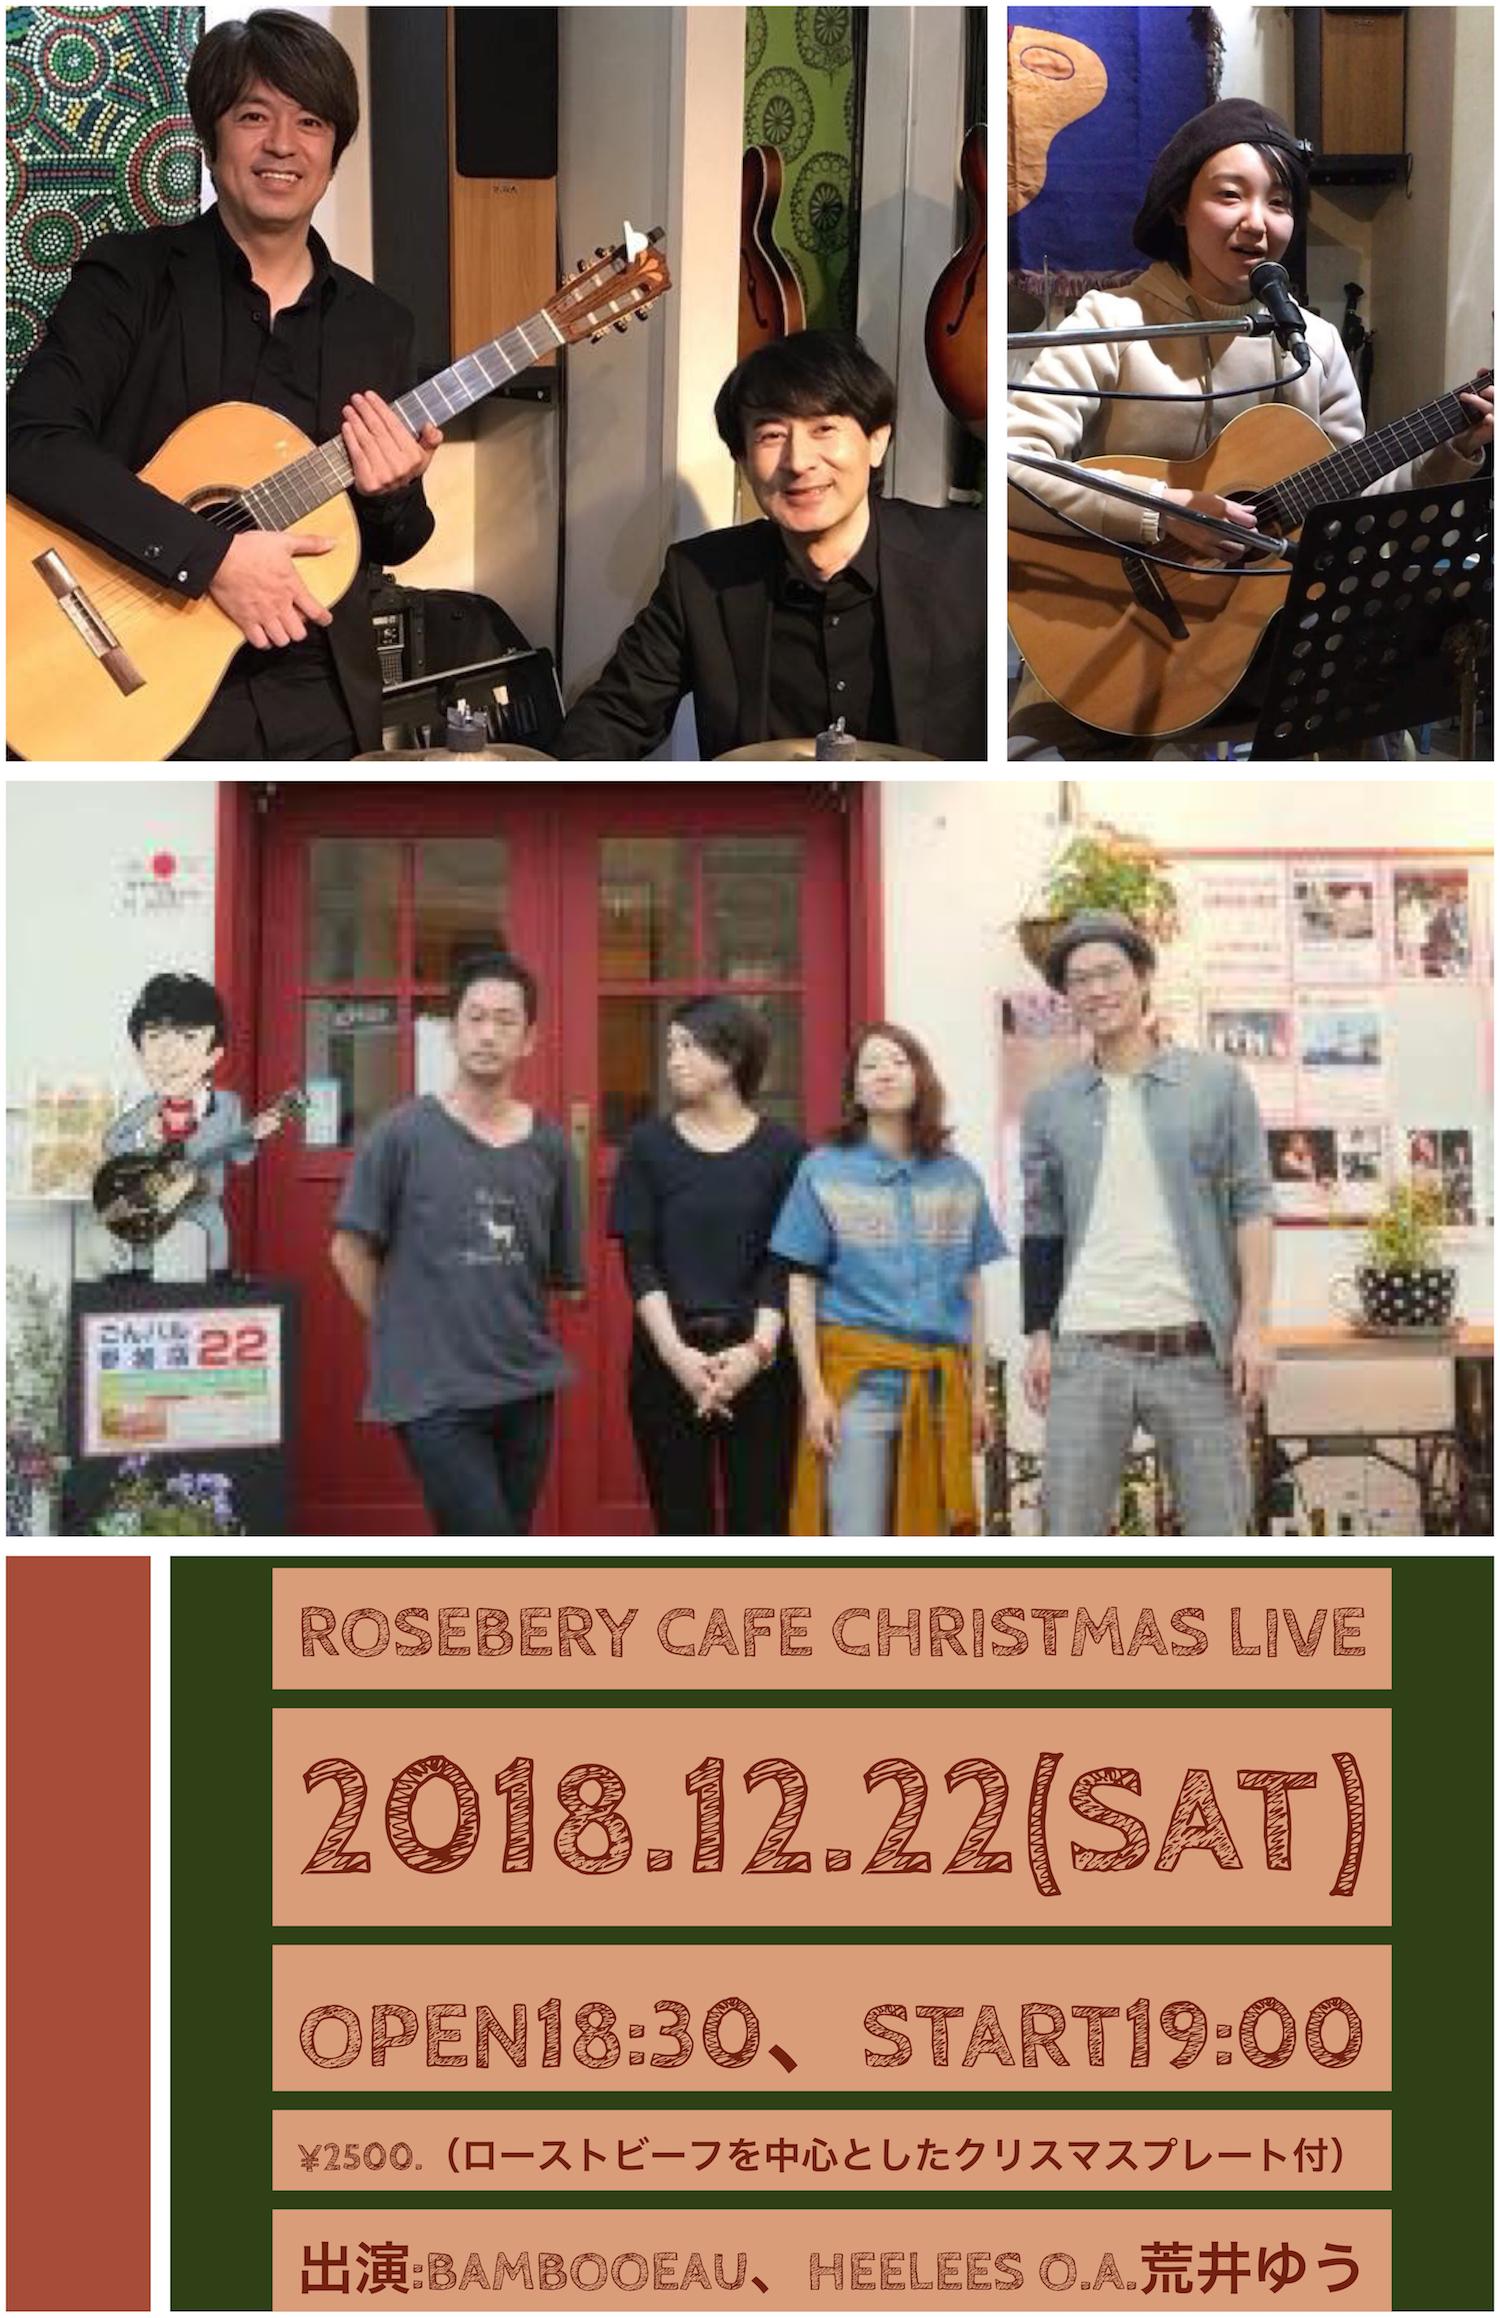 Rosebery Cafe Christmas Live